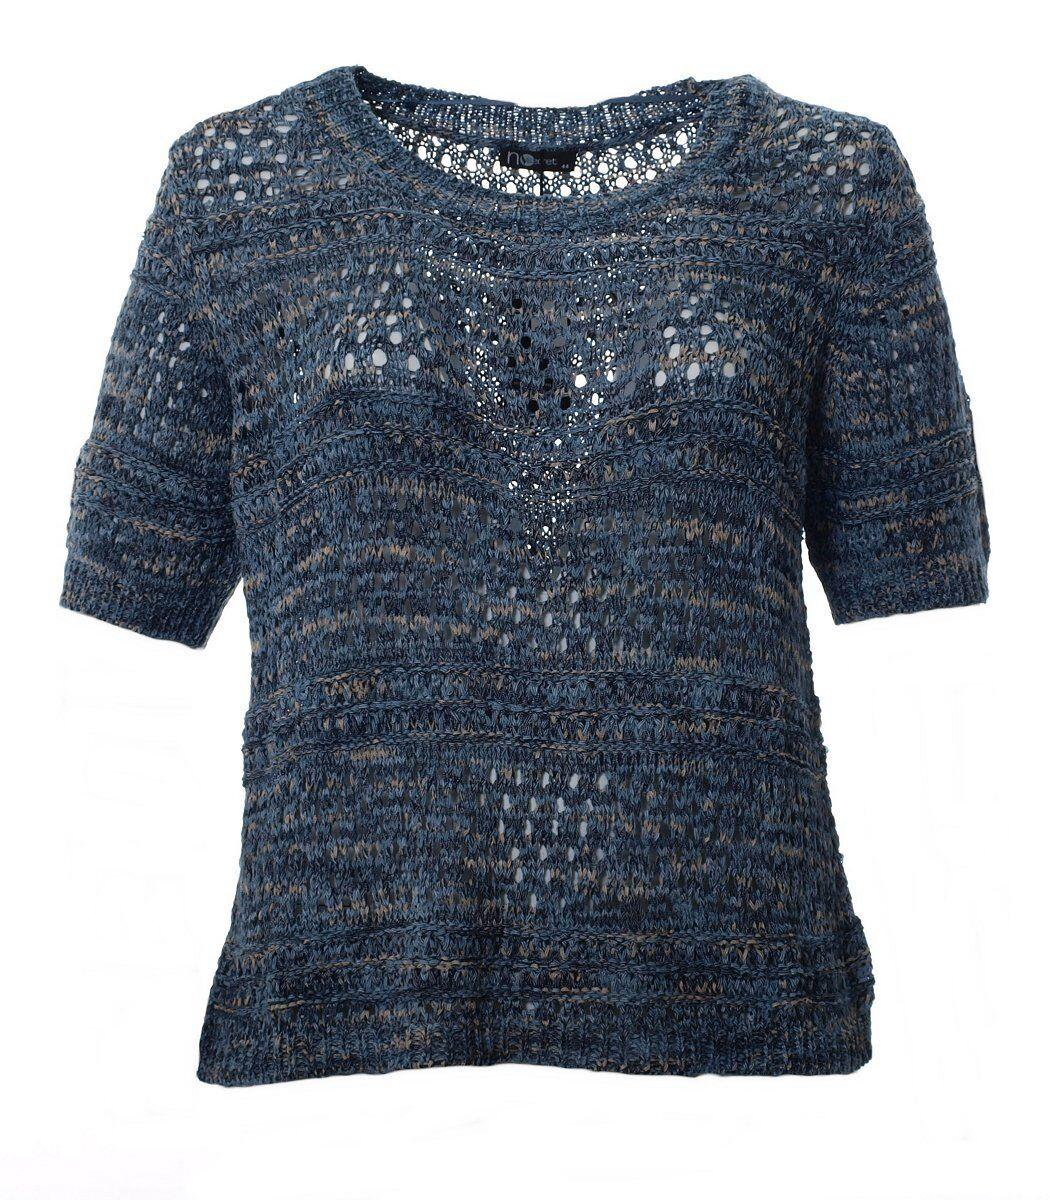 No Secret Secret Secret Häkel-Pullover Damen kurzarm Ajour Blau Melange große Größen | München Online Shop  10c8ee